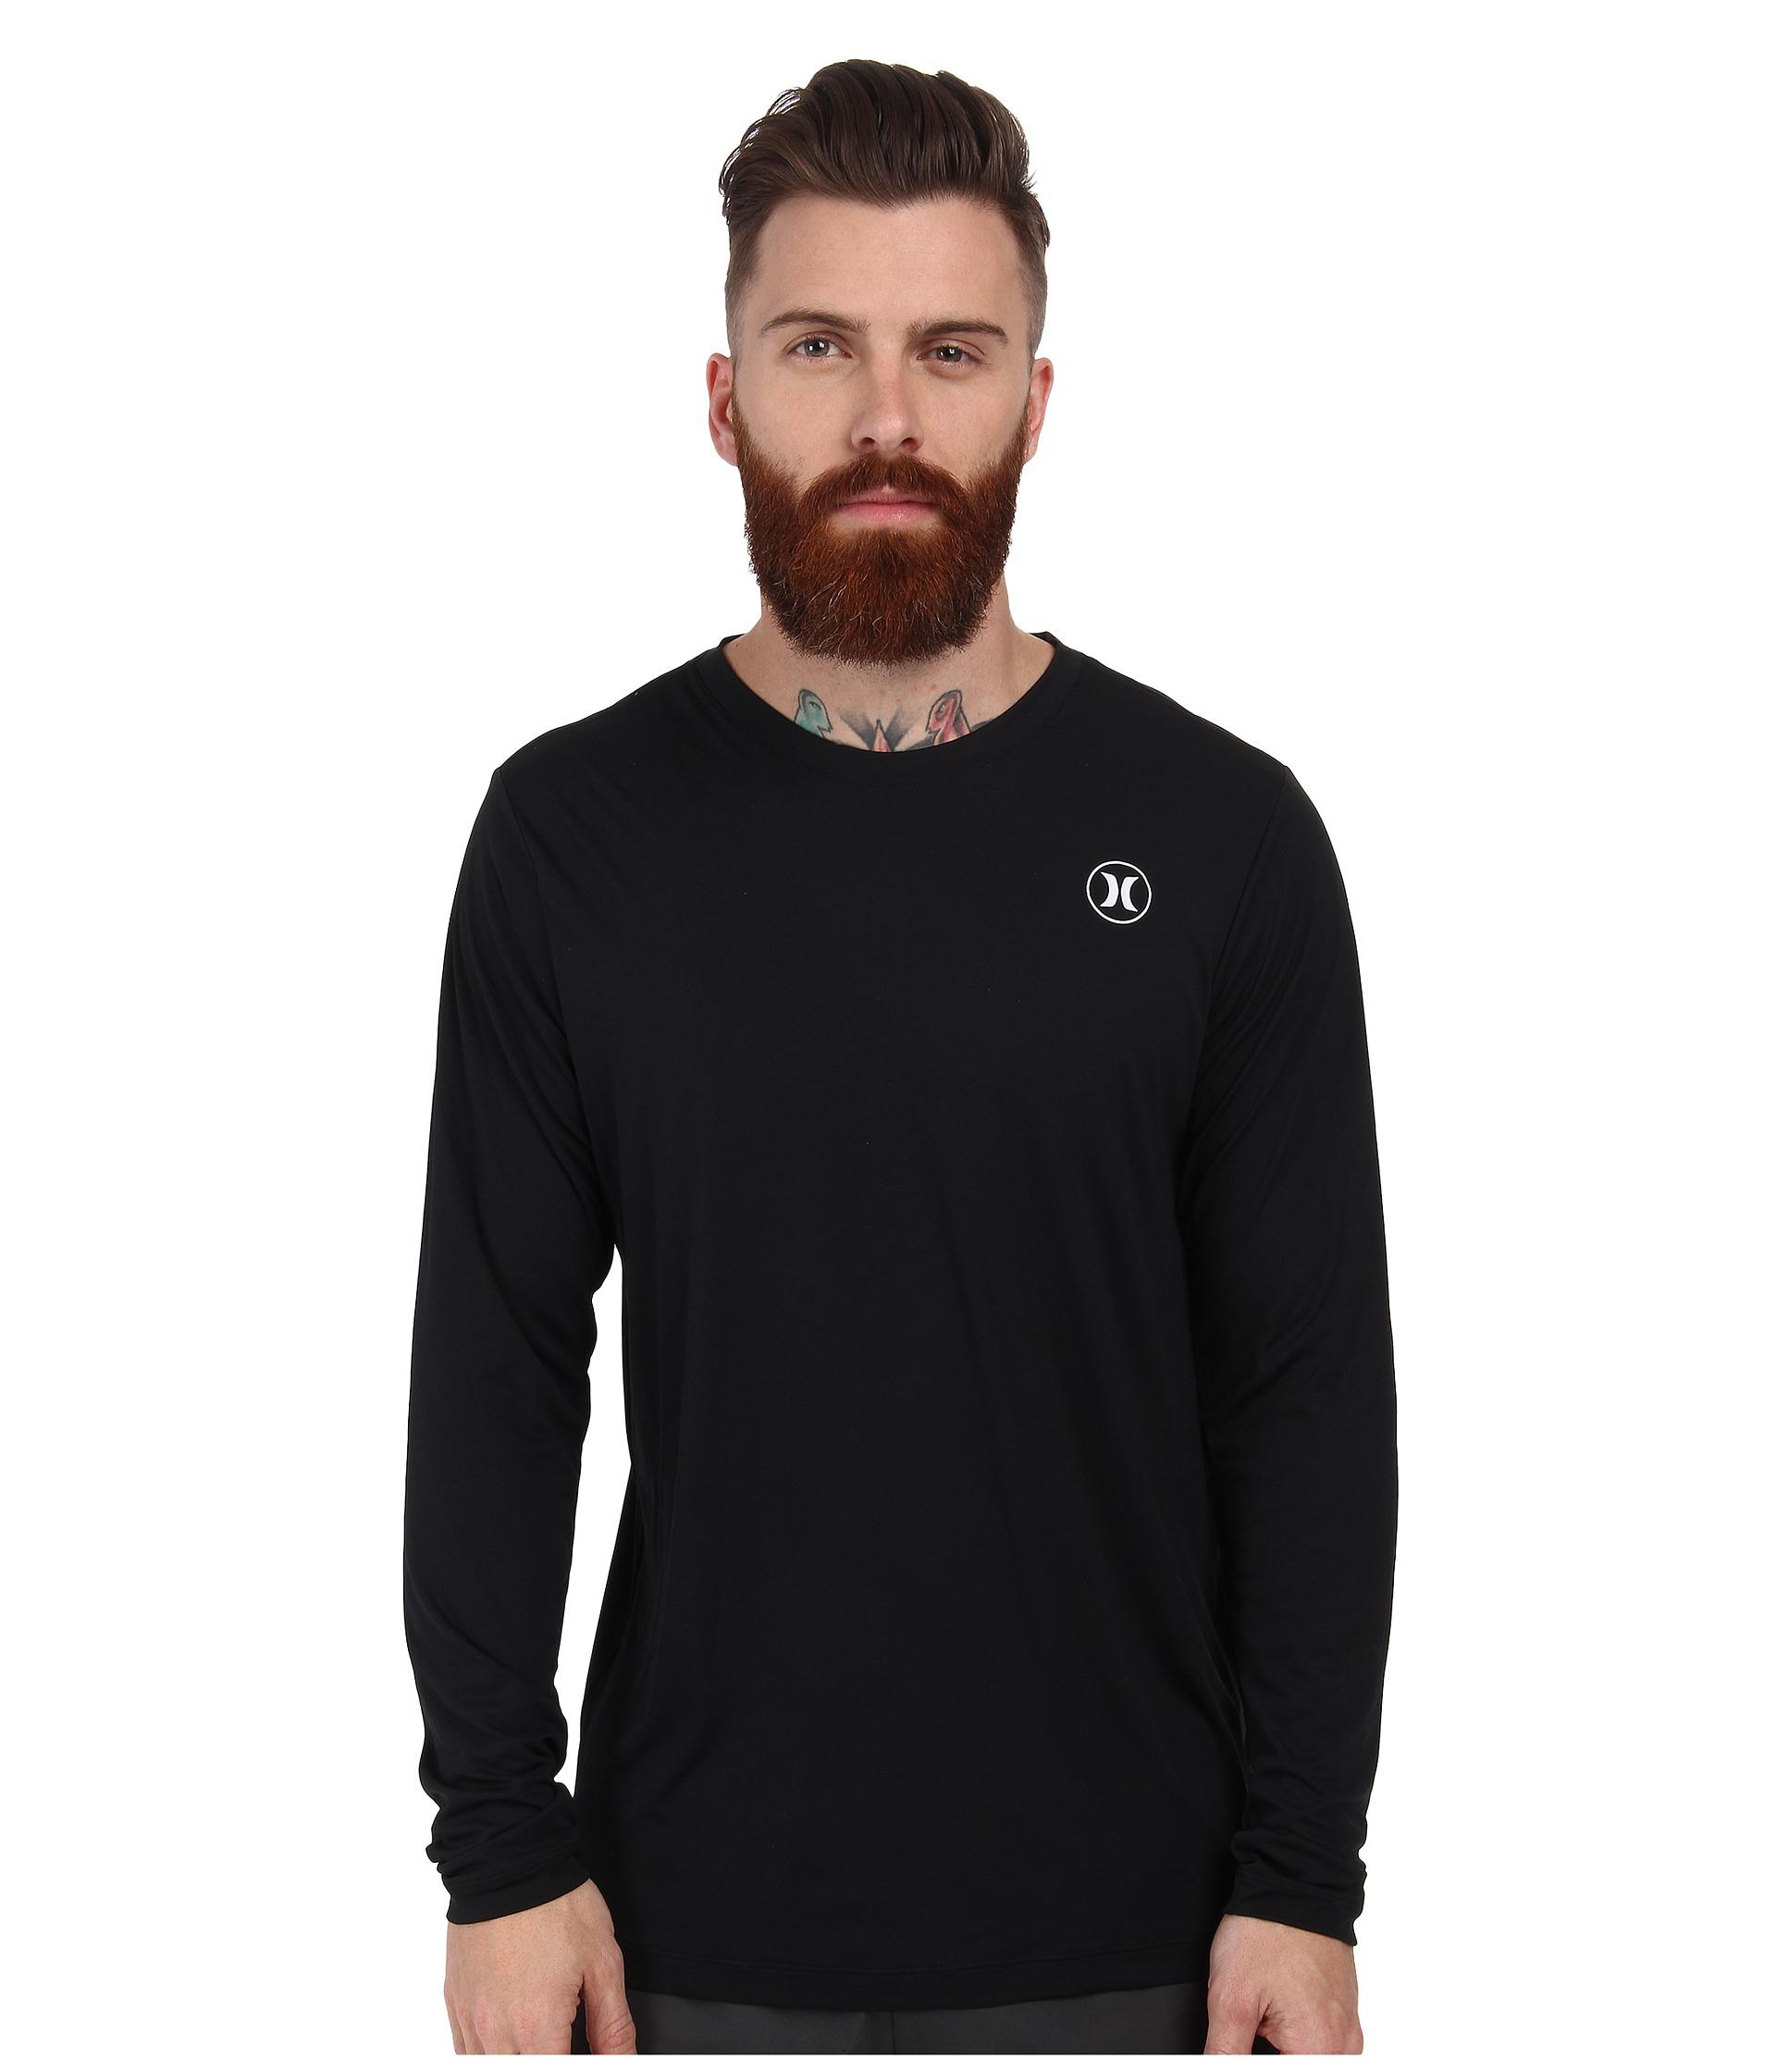 Black hurley t shirt - Gallery